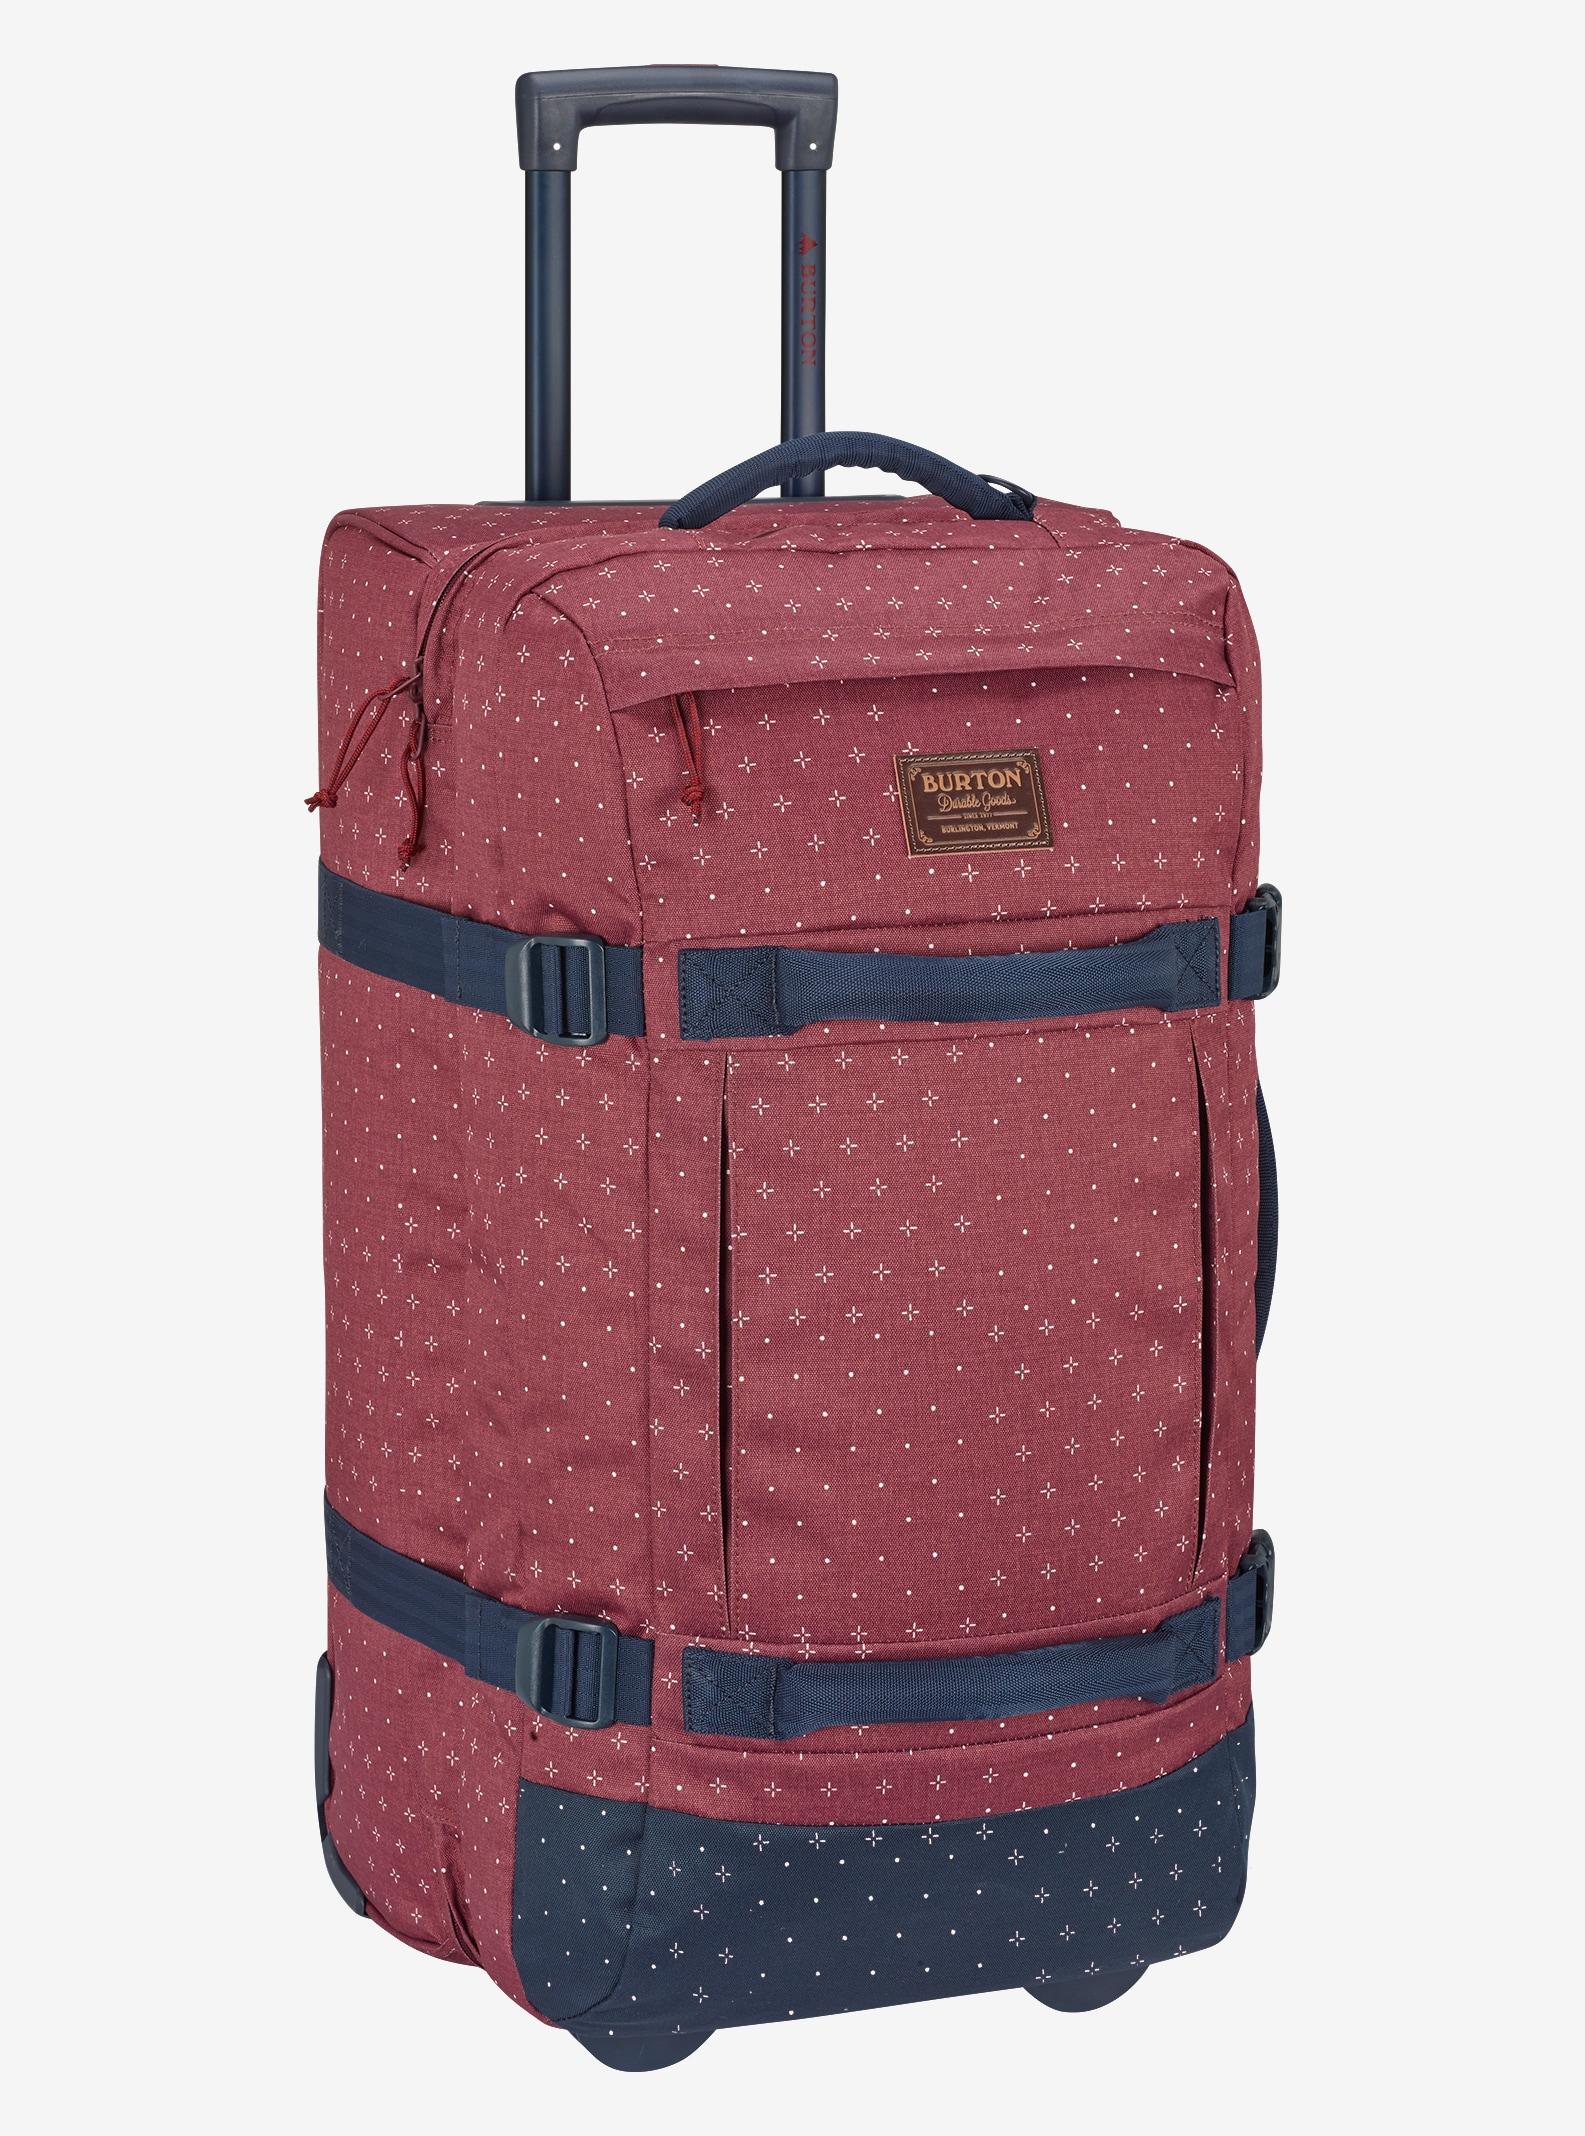 Burton Convoy Roller Travel Bag shown in Mandana Print